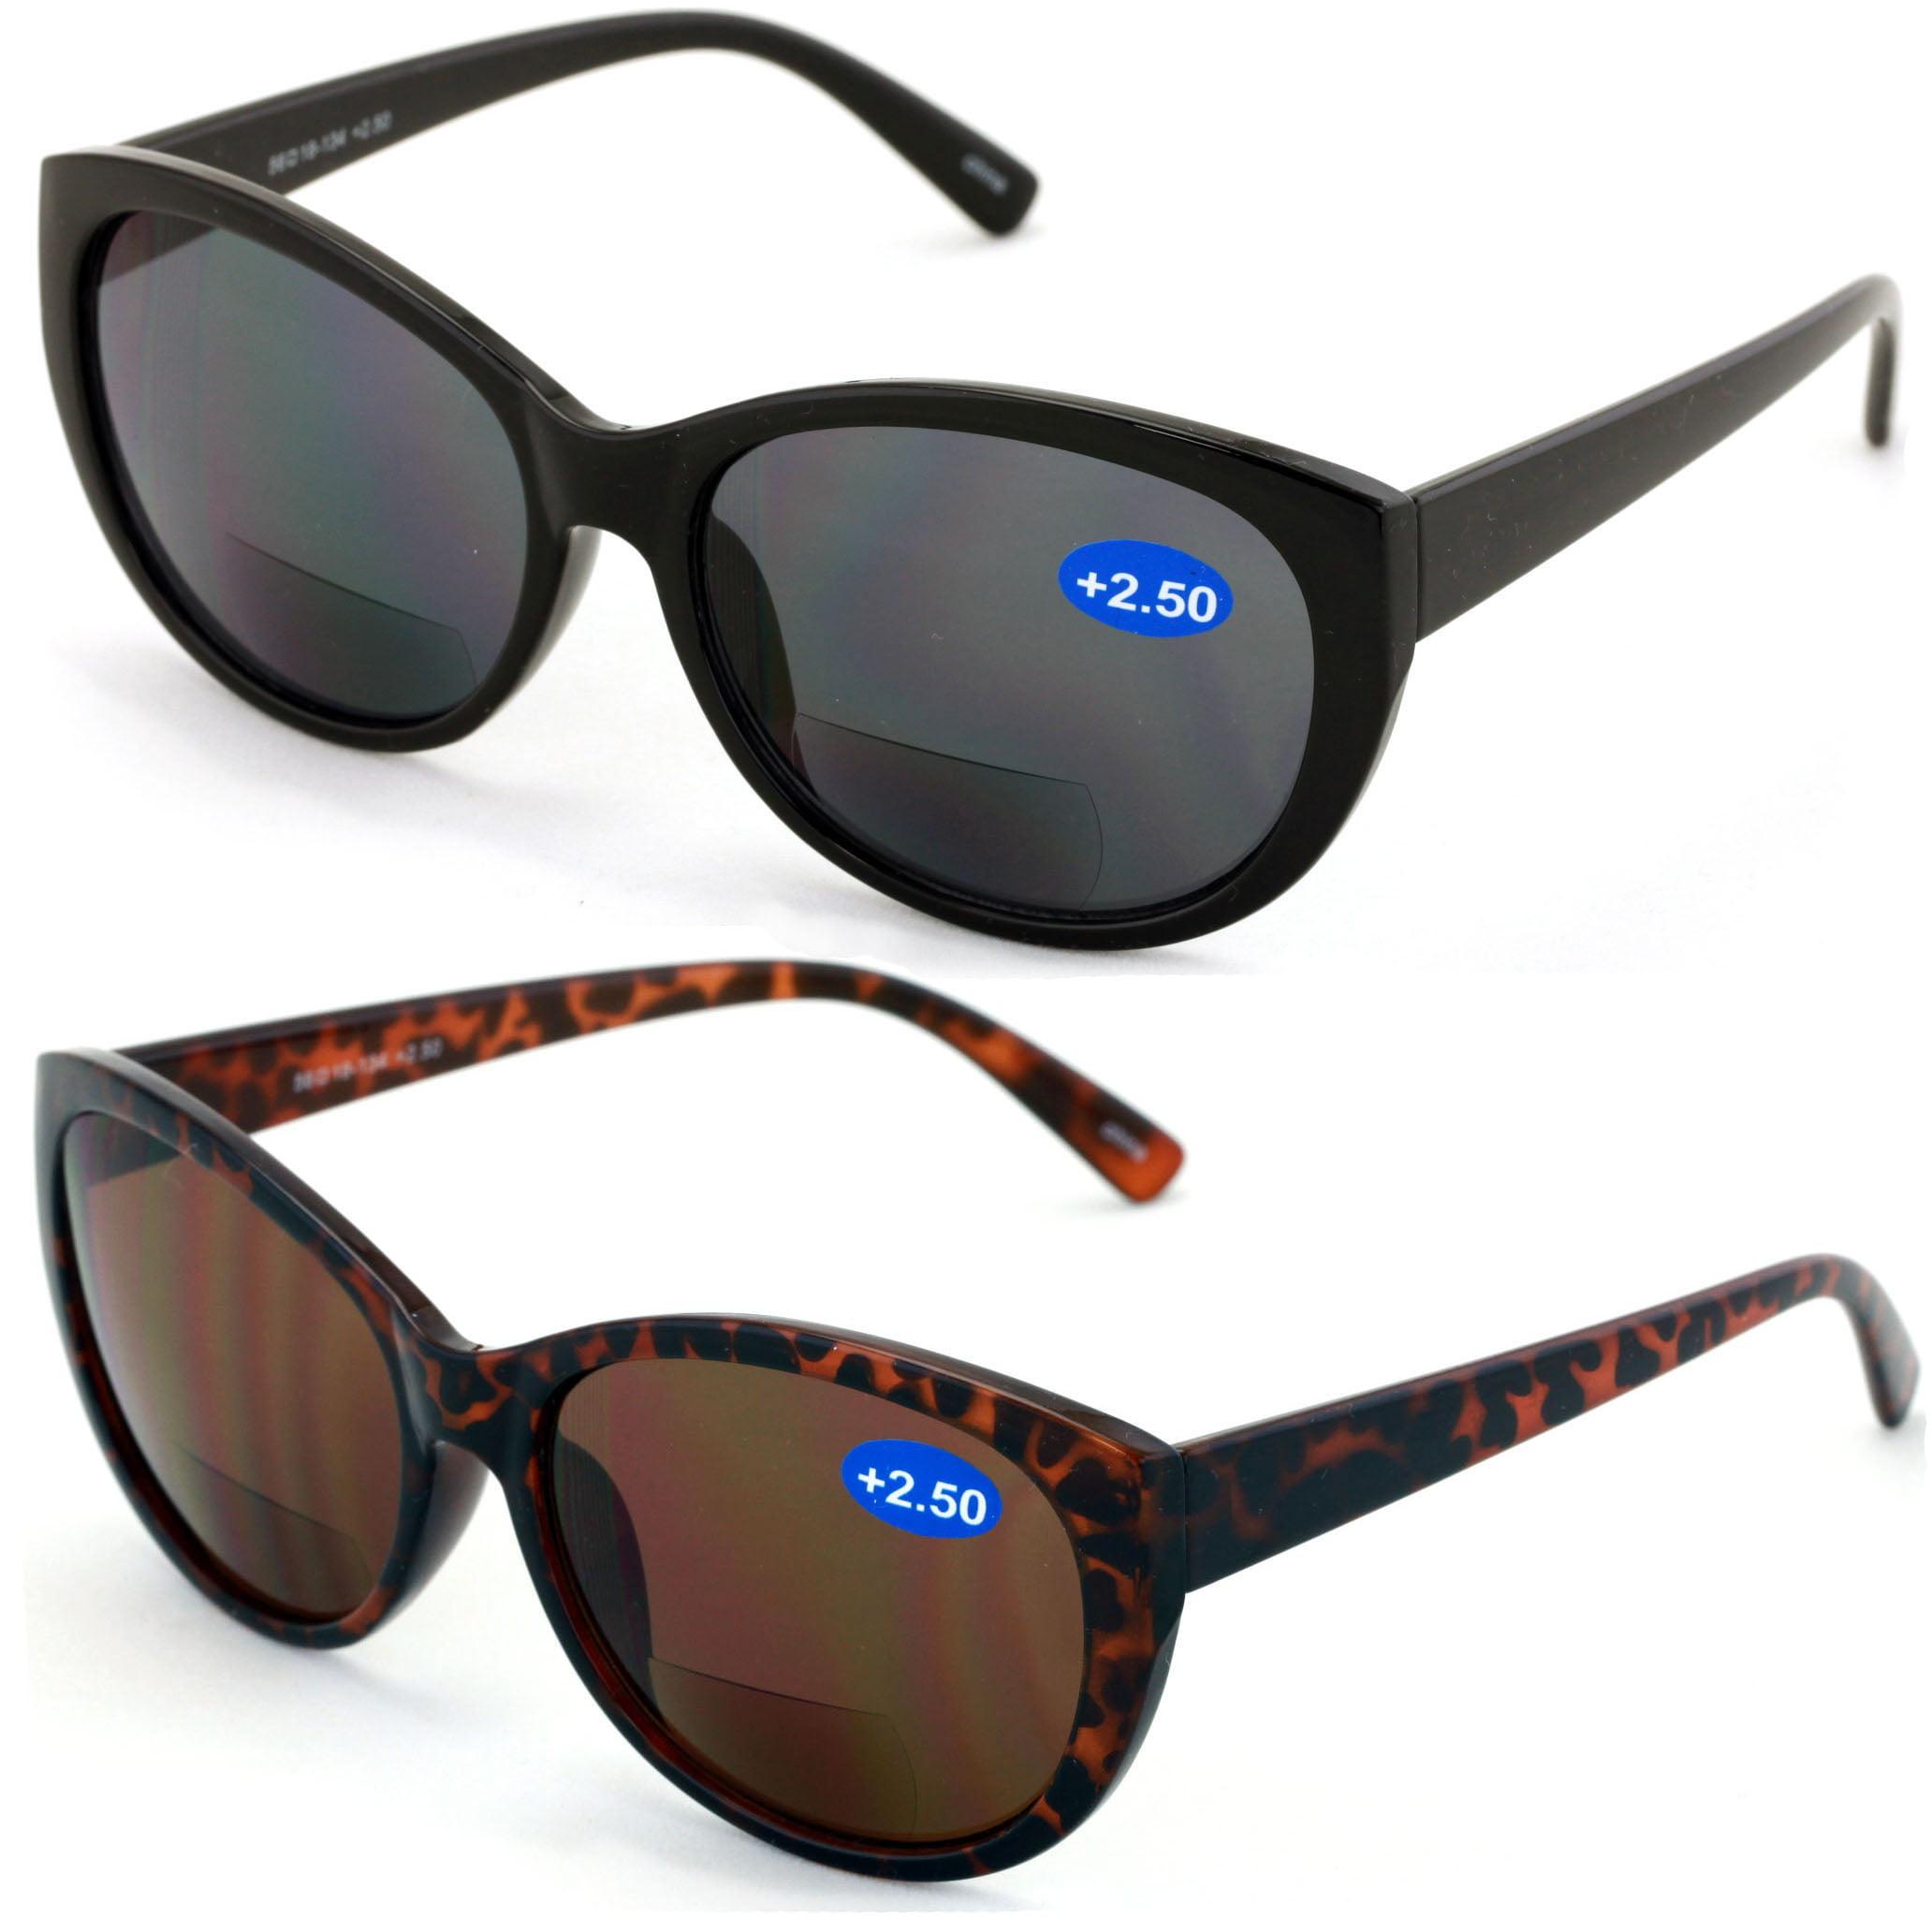 1466cbad7dbb V.W.E. - V.W.E. 2 Pairs Women Bifocal Reading Sunglasses Reader Glasses  Cateye Vintage Jackie O Black Brown - Walmart.com